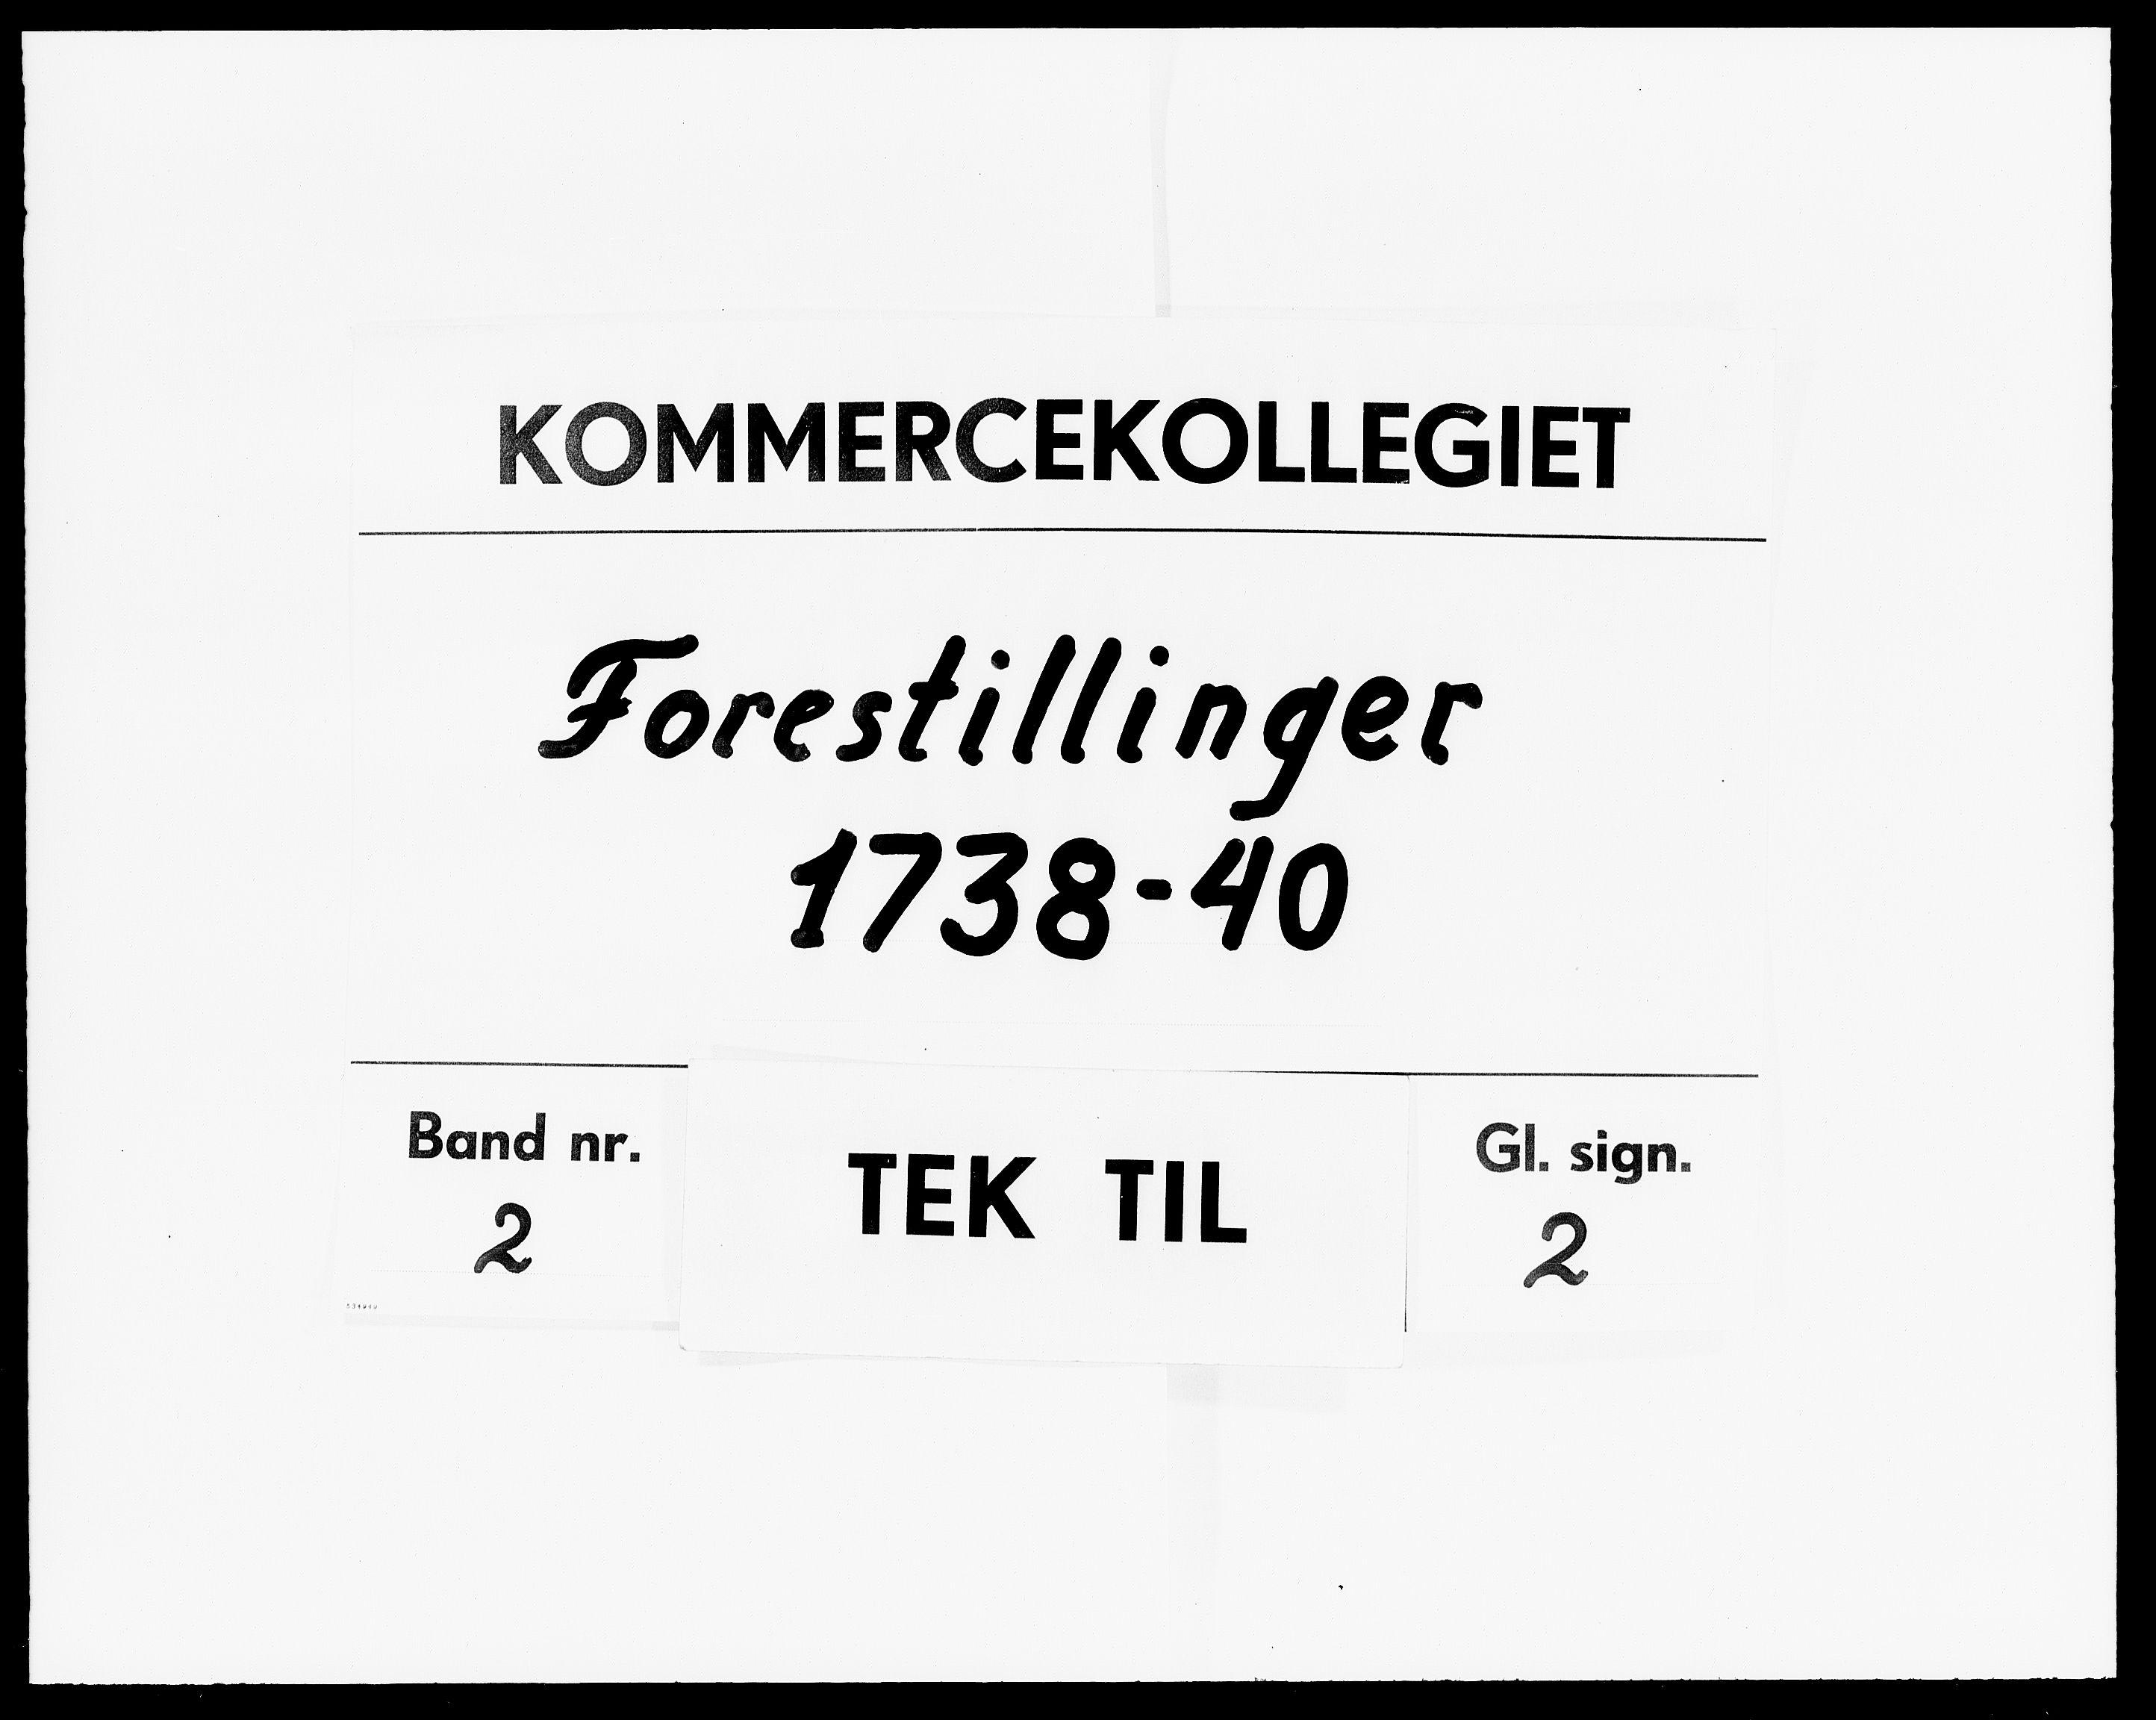 DRA, Kommercekollegiet, Dansk-Norske Sekretariat (1736-1771) / Kommercedeputationen (1771-1773), -/002: Forestillinger, 1738-1740